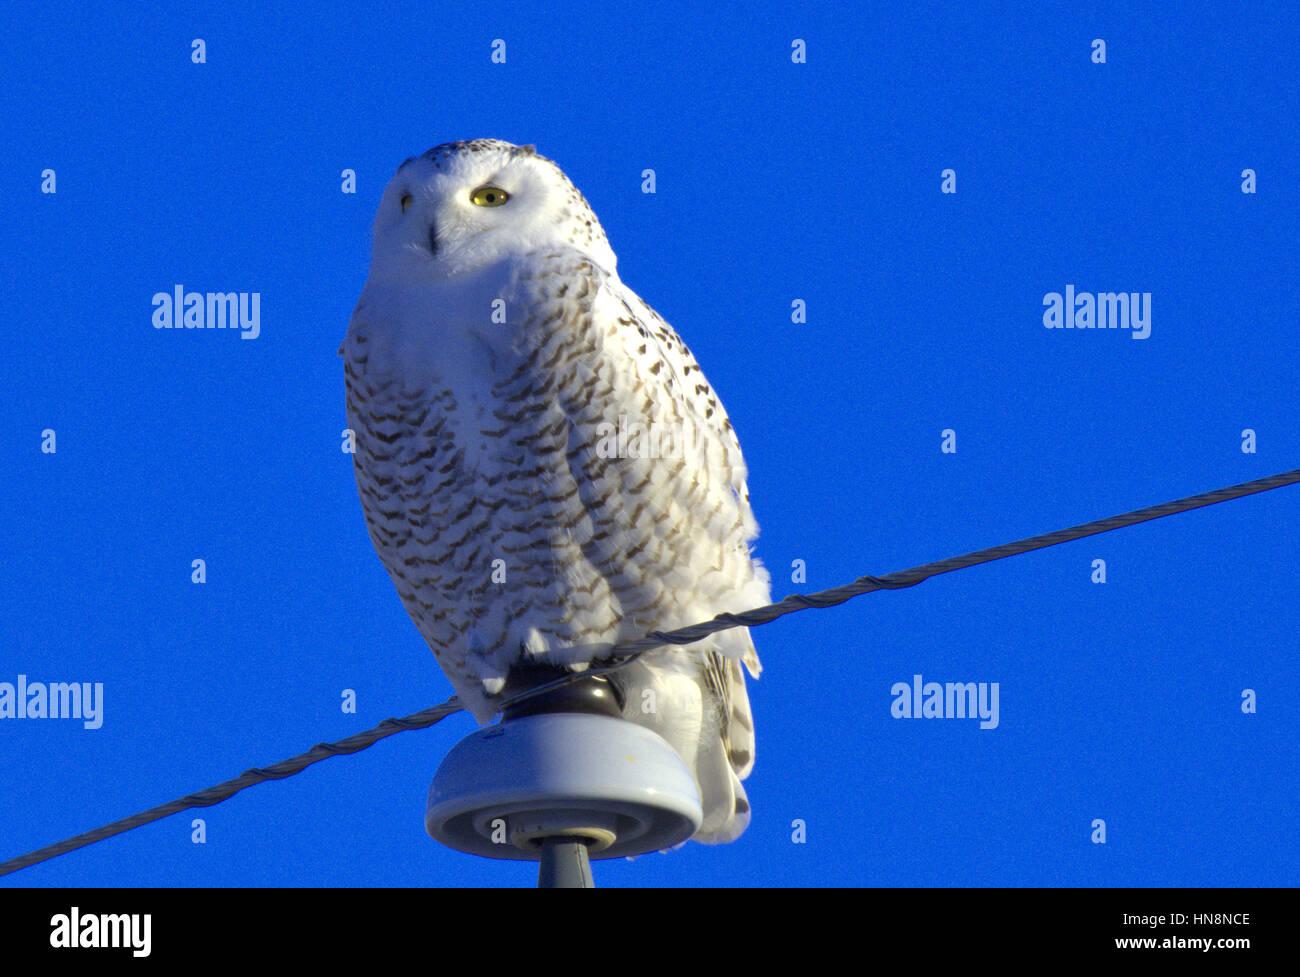 Stoic Snowy Owl - Stock Image